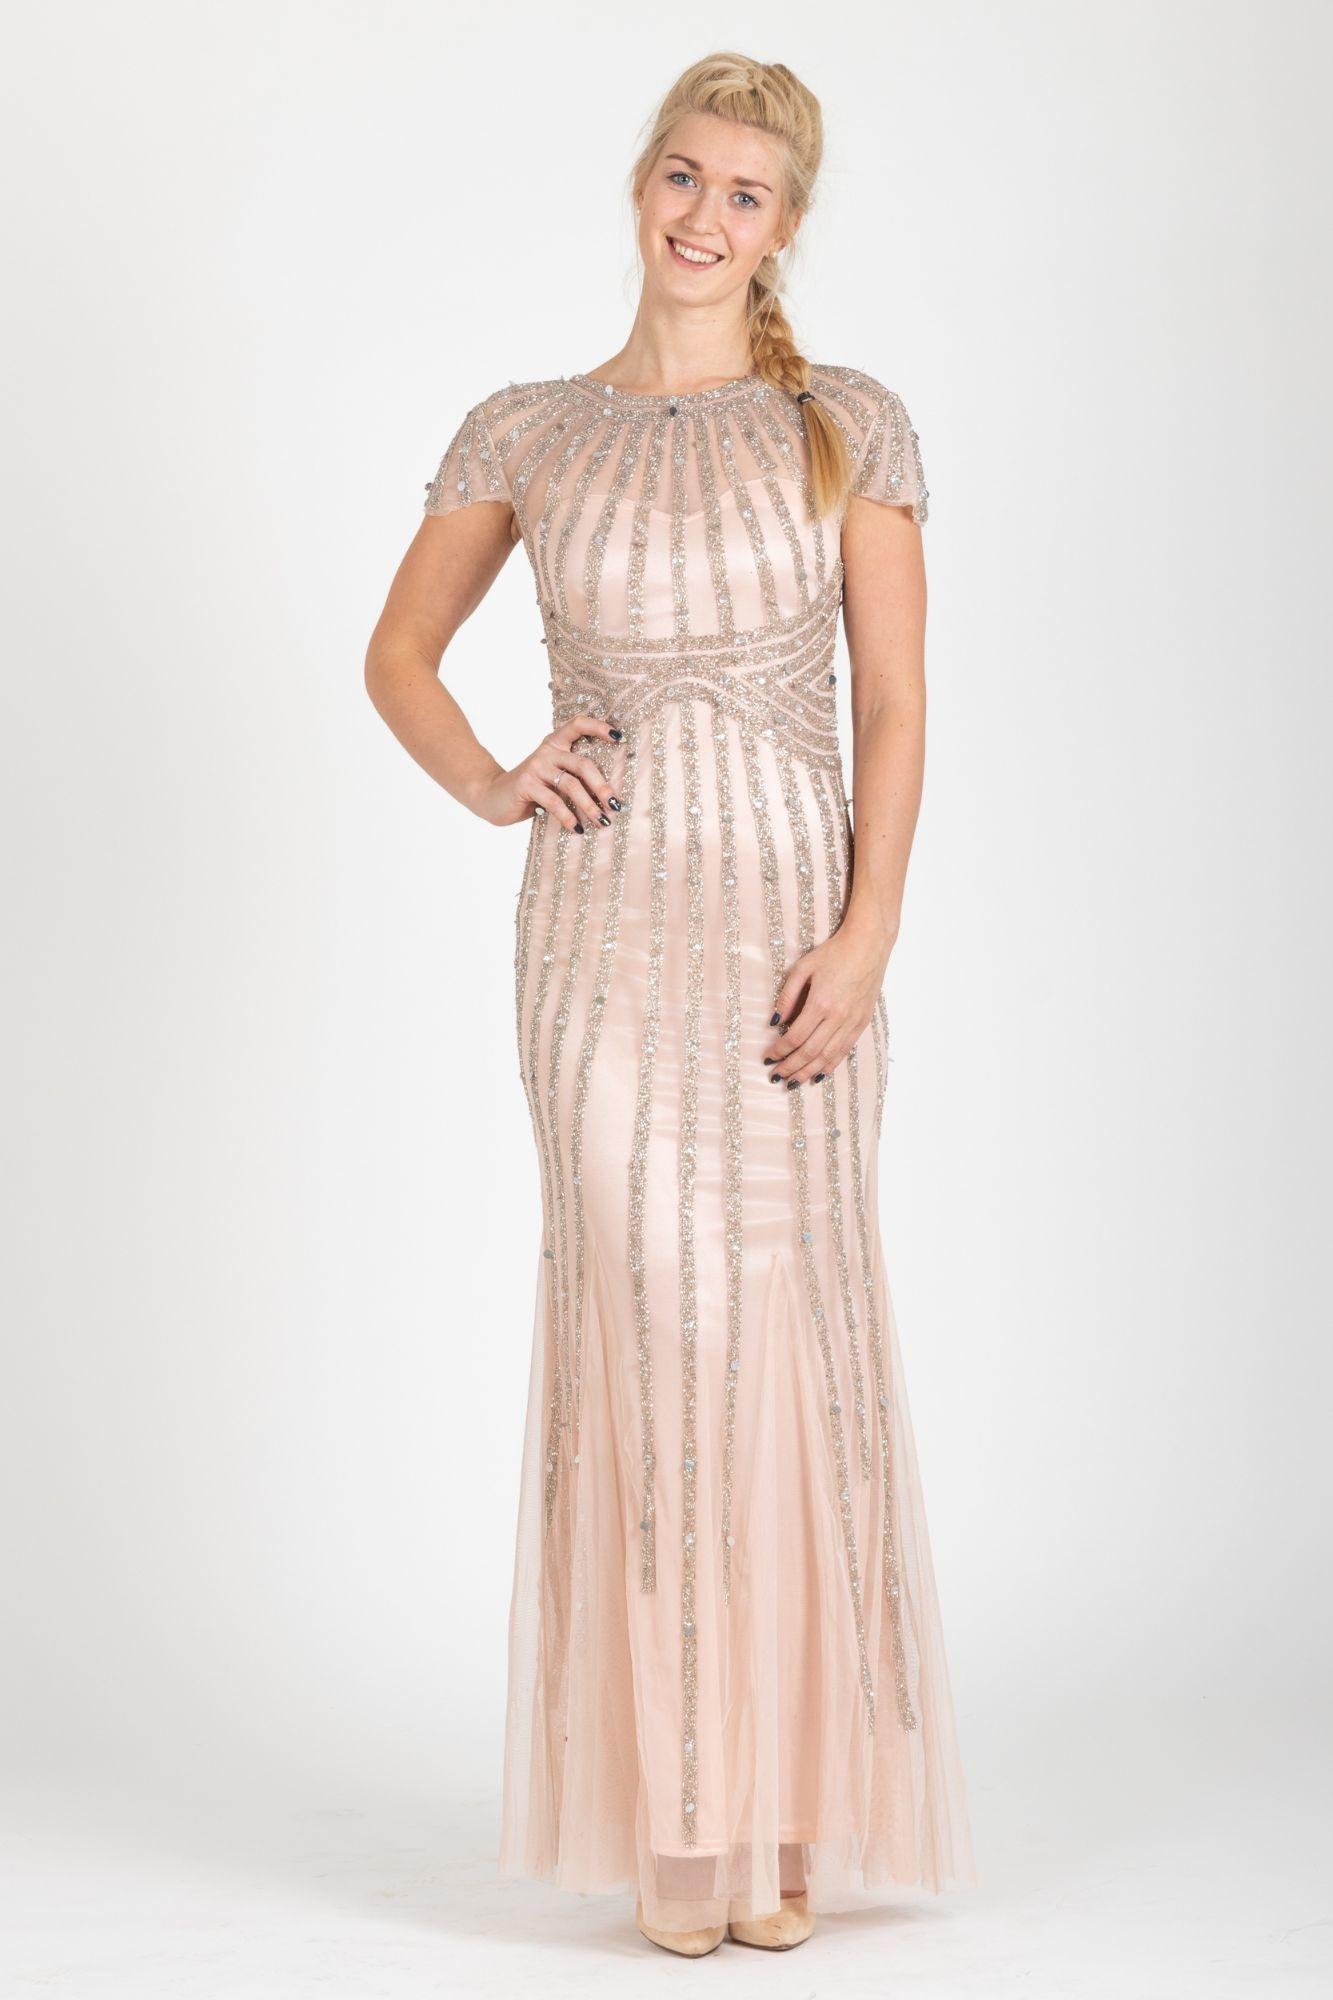 e0f297d59c83 Plesové šaty Hviezdny prach